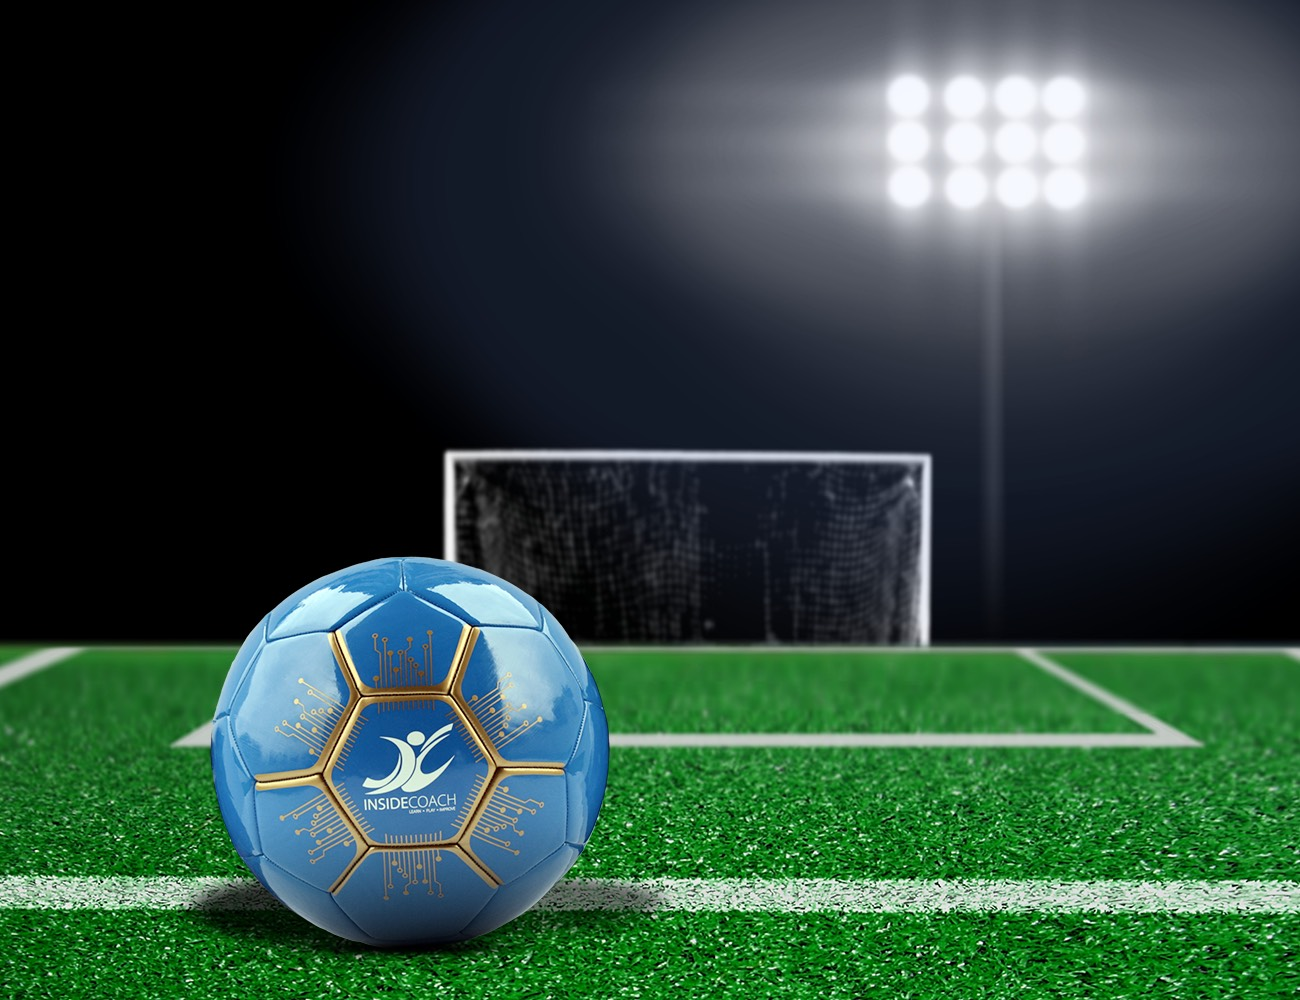 InsideCoach – Connected Smart Soccer Ball